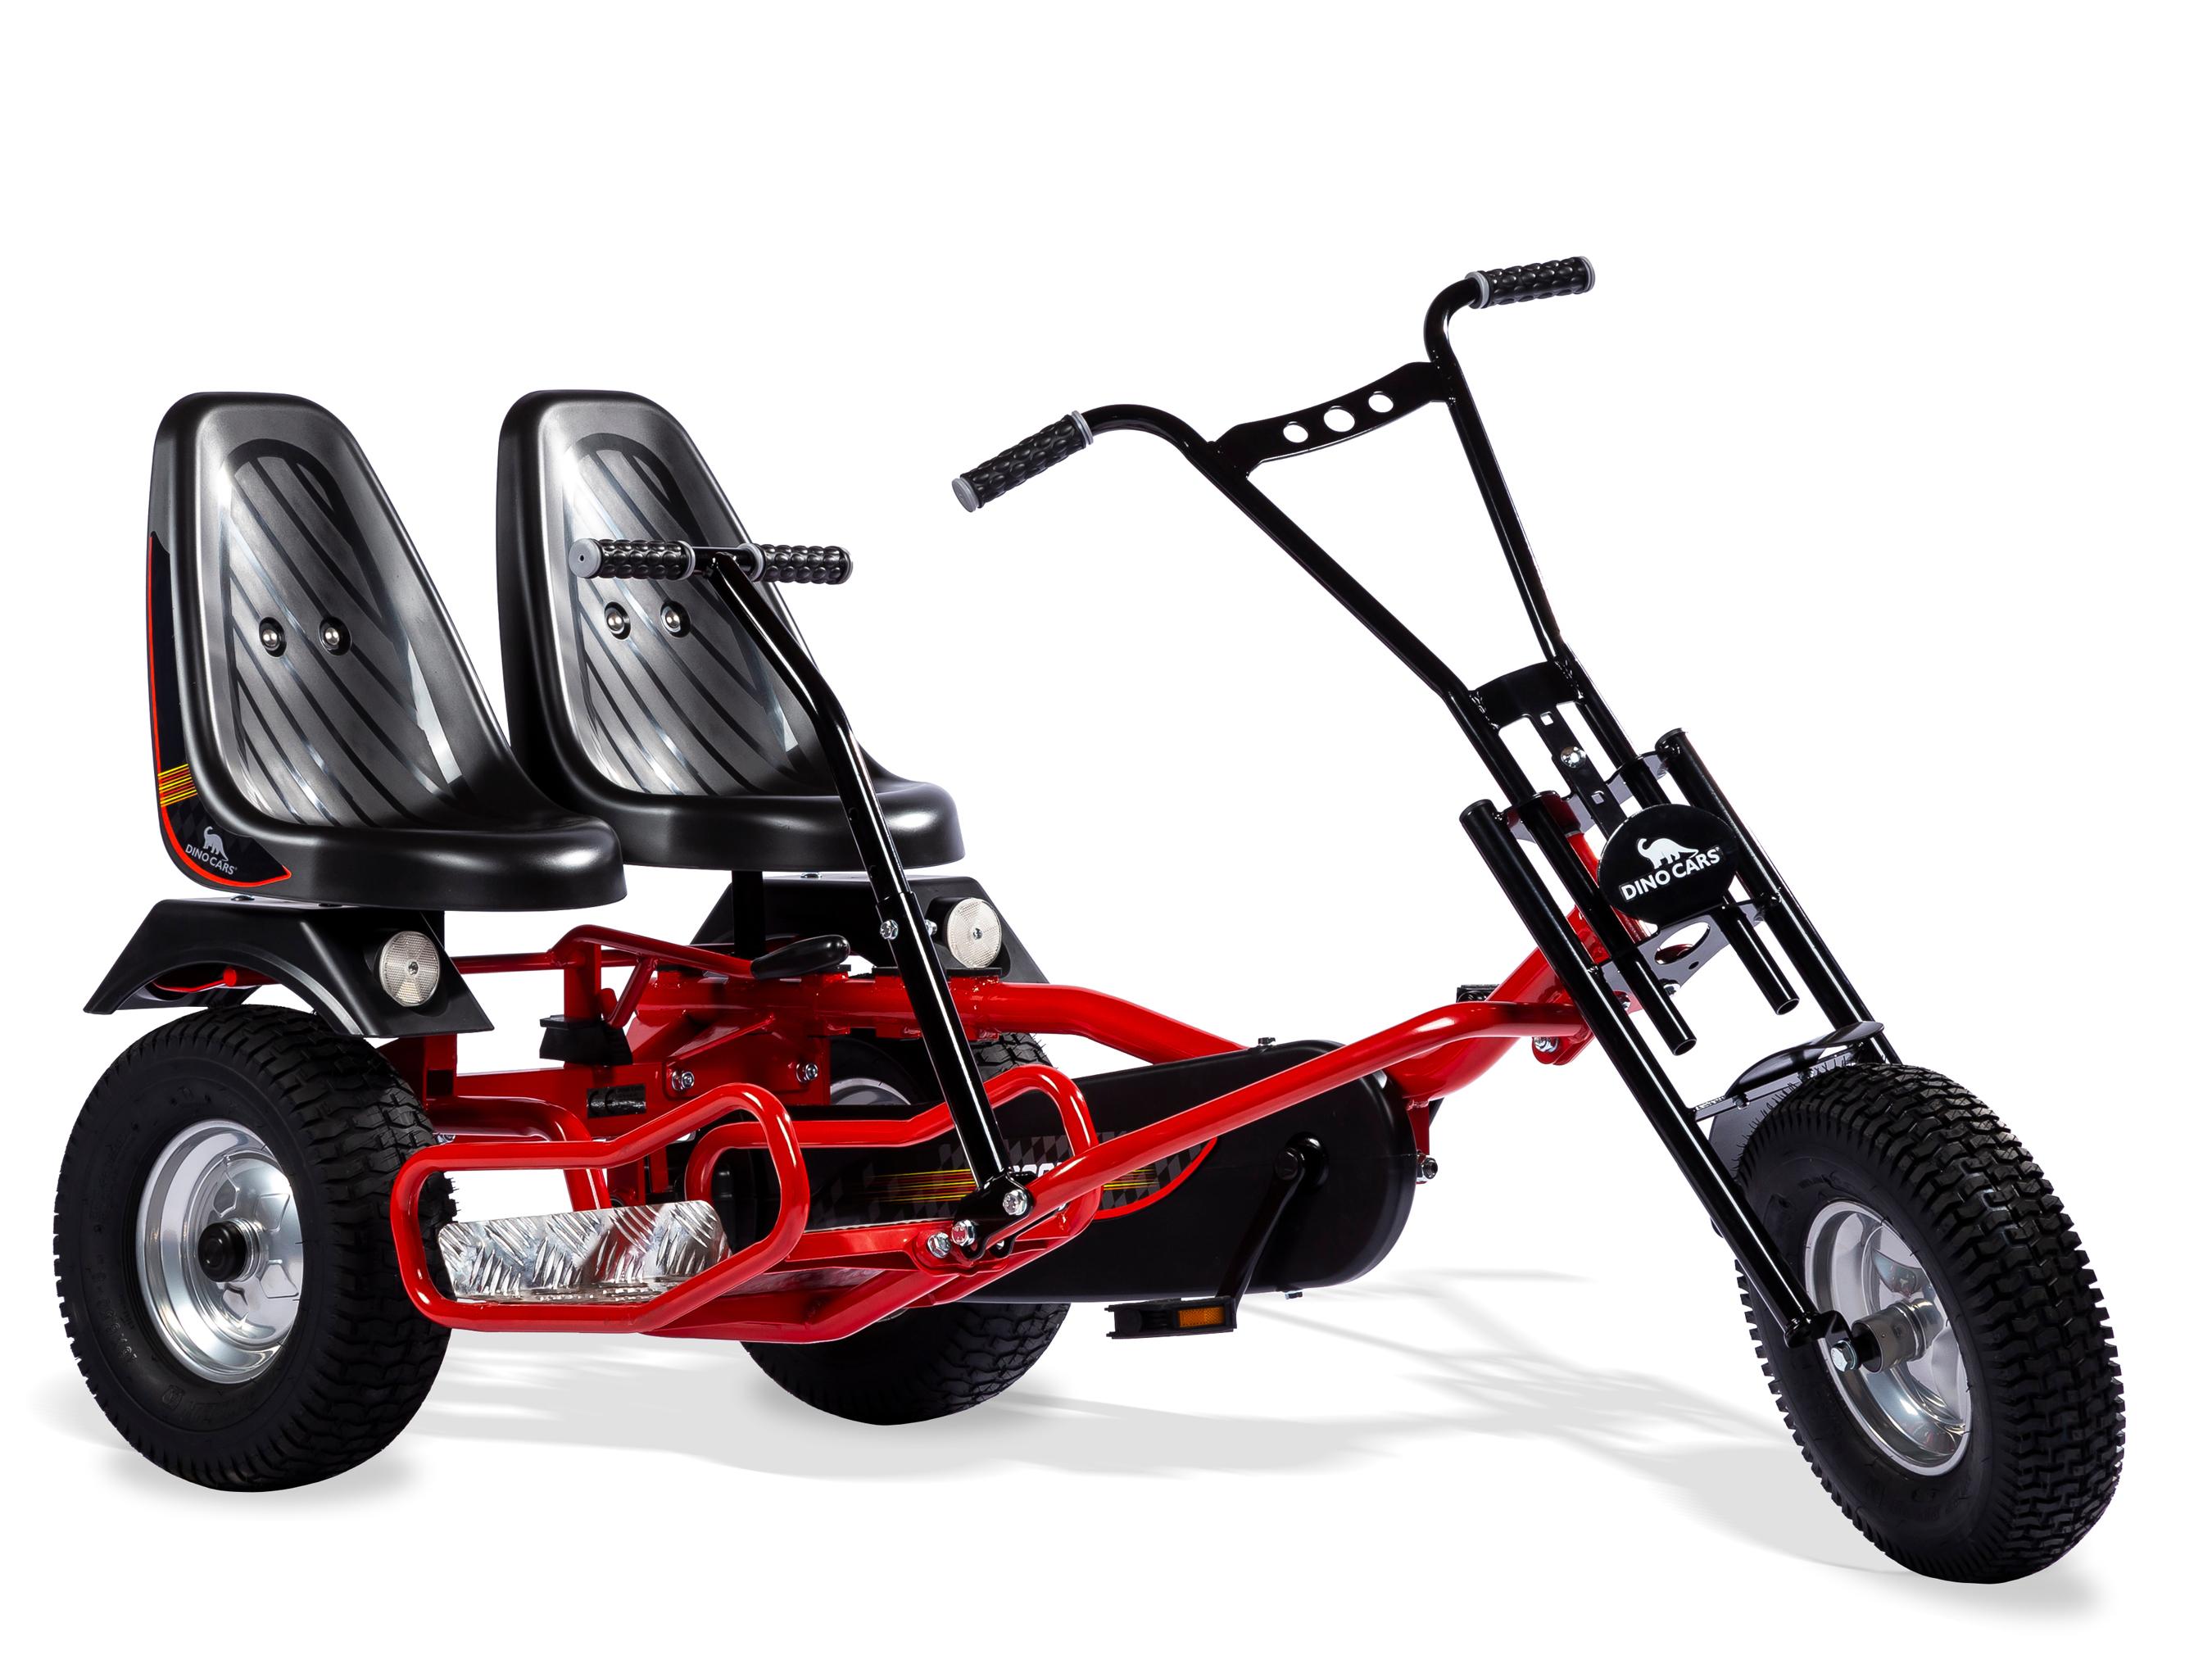 Gokart / Pedal-Gokart ProLine 2 Rider F DINO CARS Bild 1